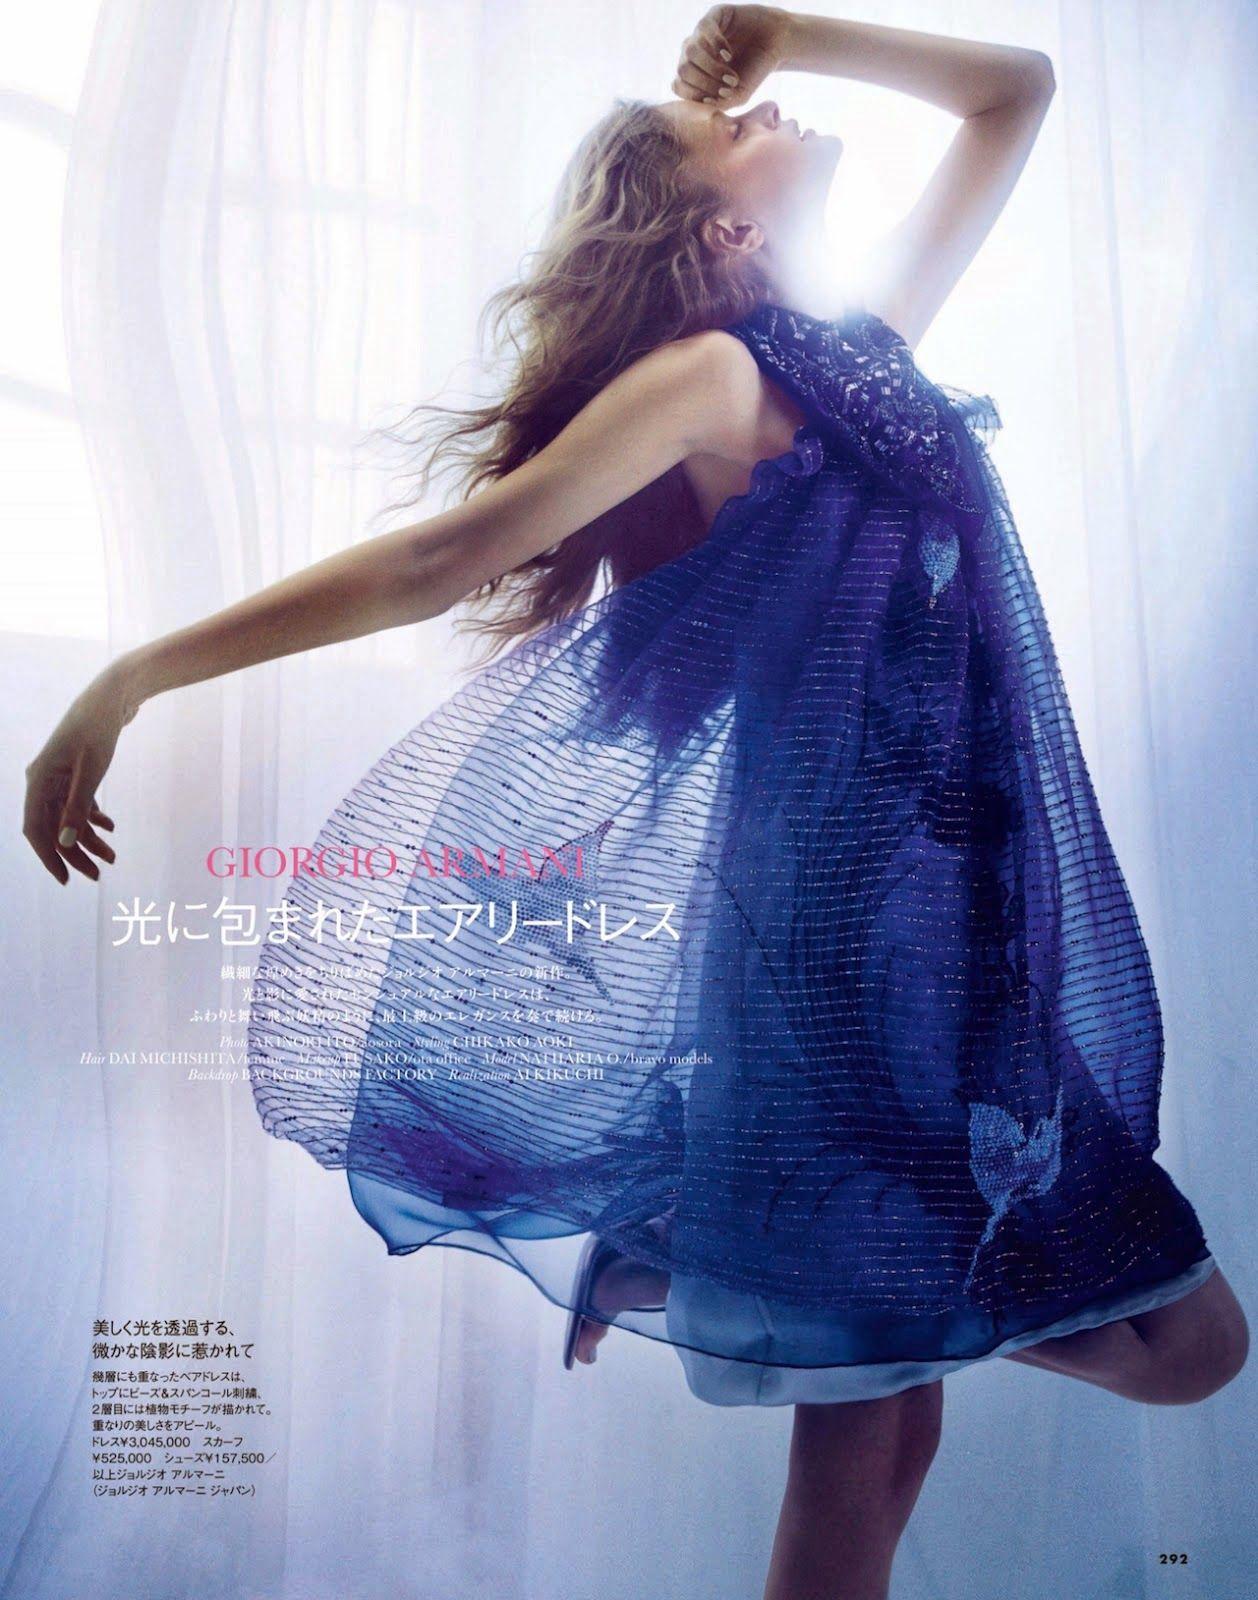 """Giorgio Armani"" Nathalia Oliveira by Akinori Ito for ELLE Japan May 2014"